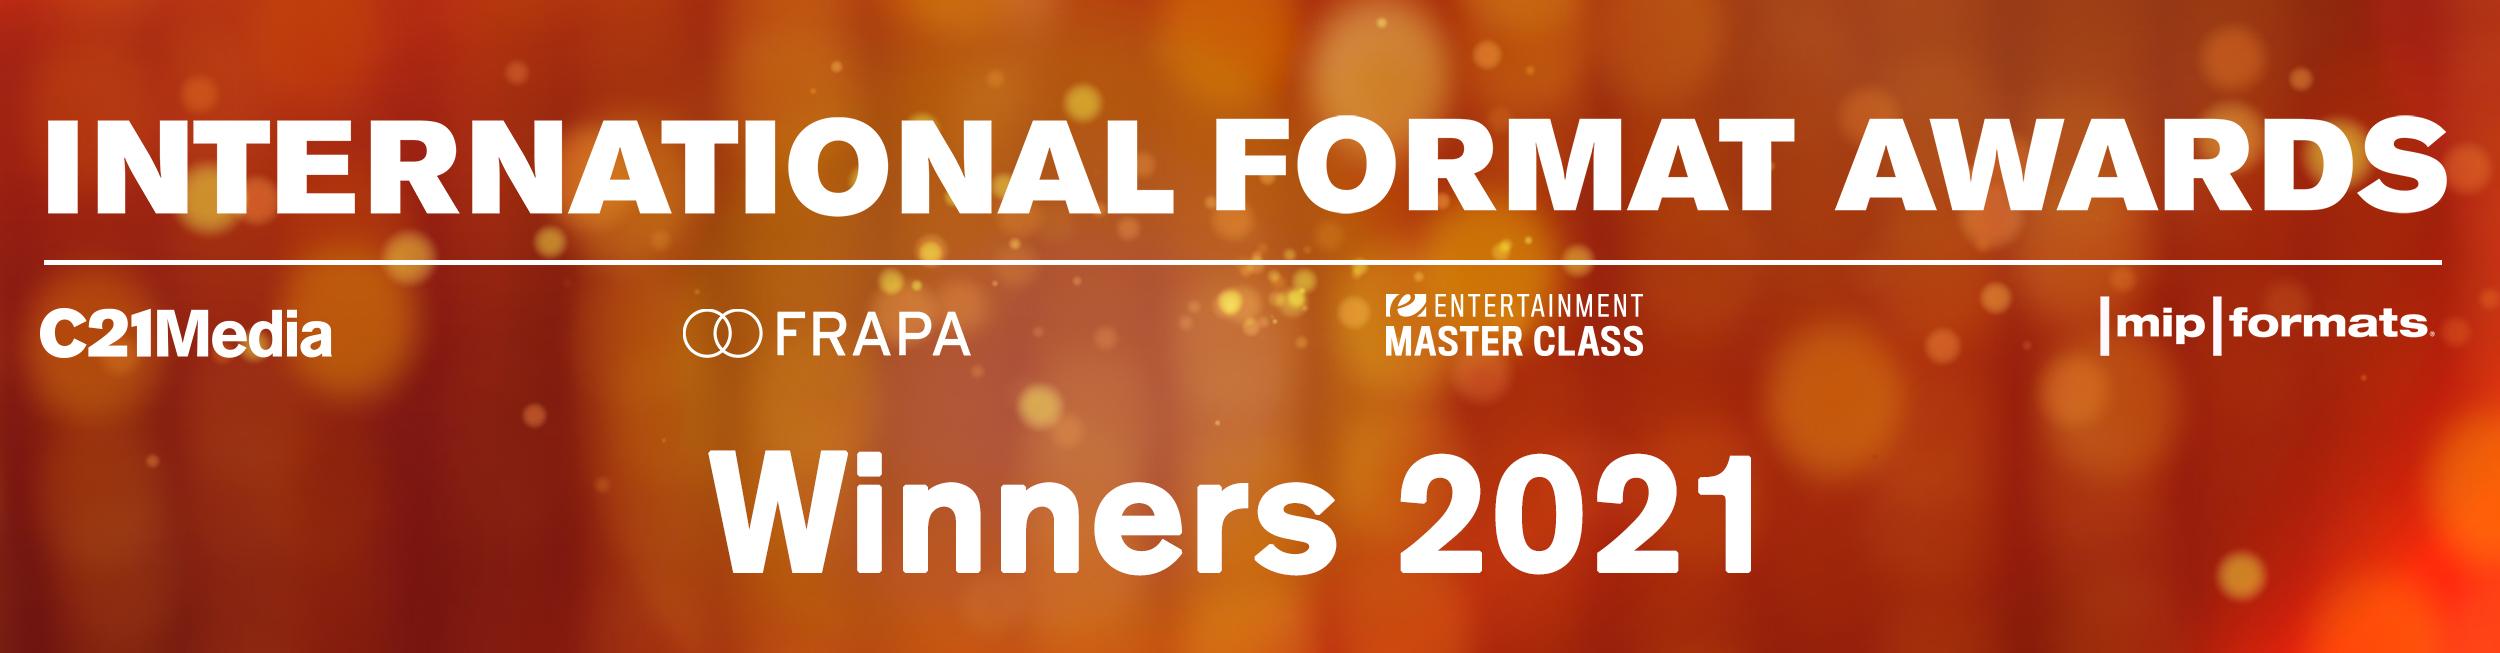 IFA Winner banner 2021